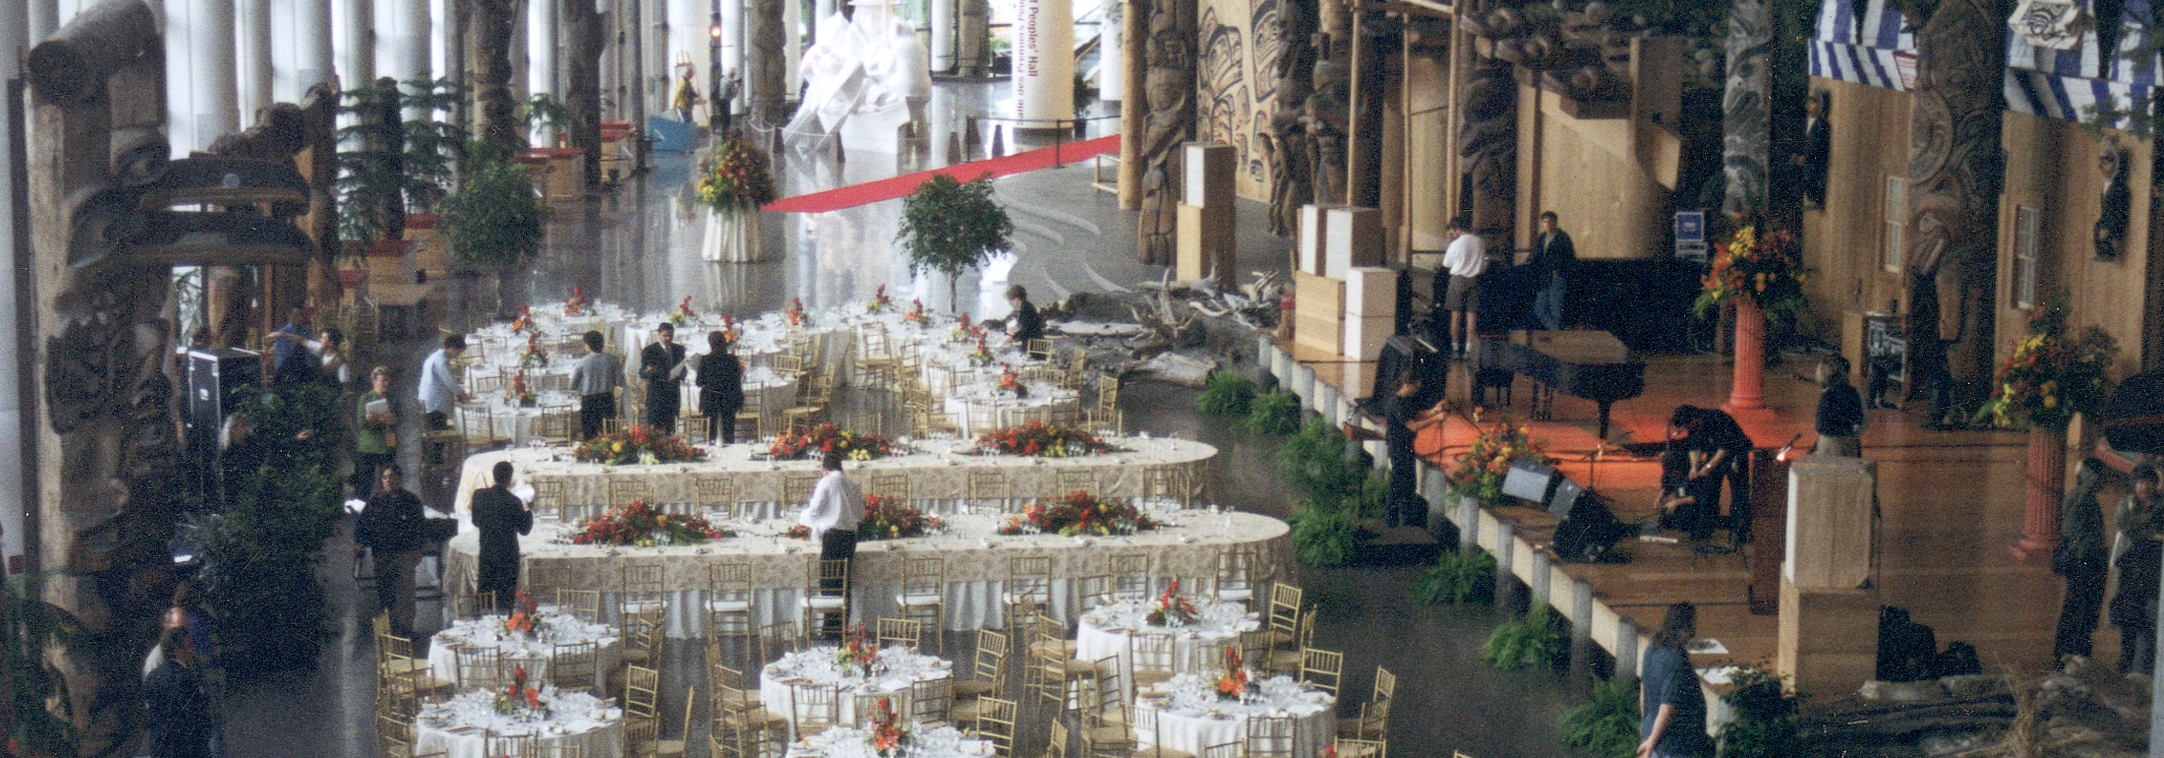 event-types